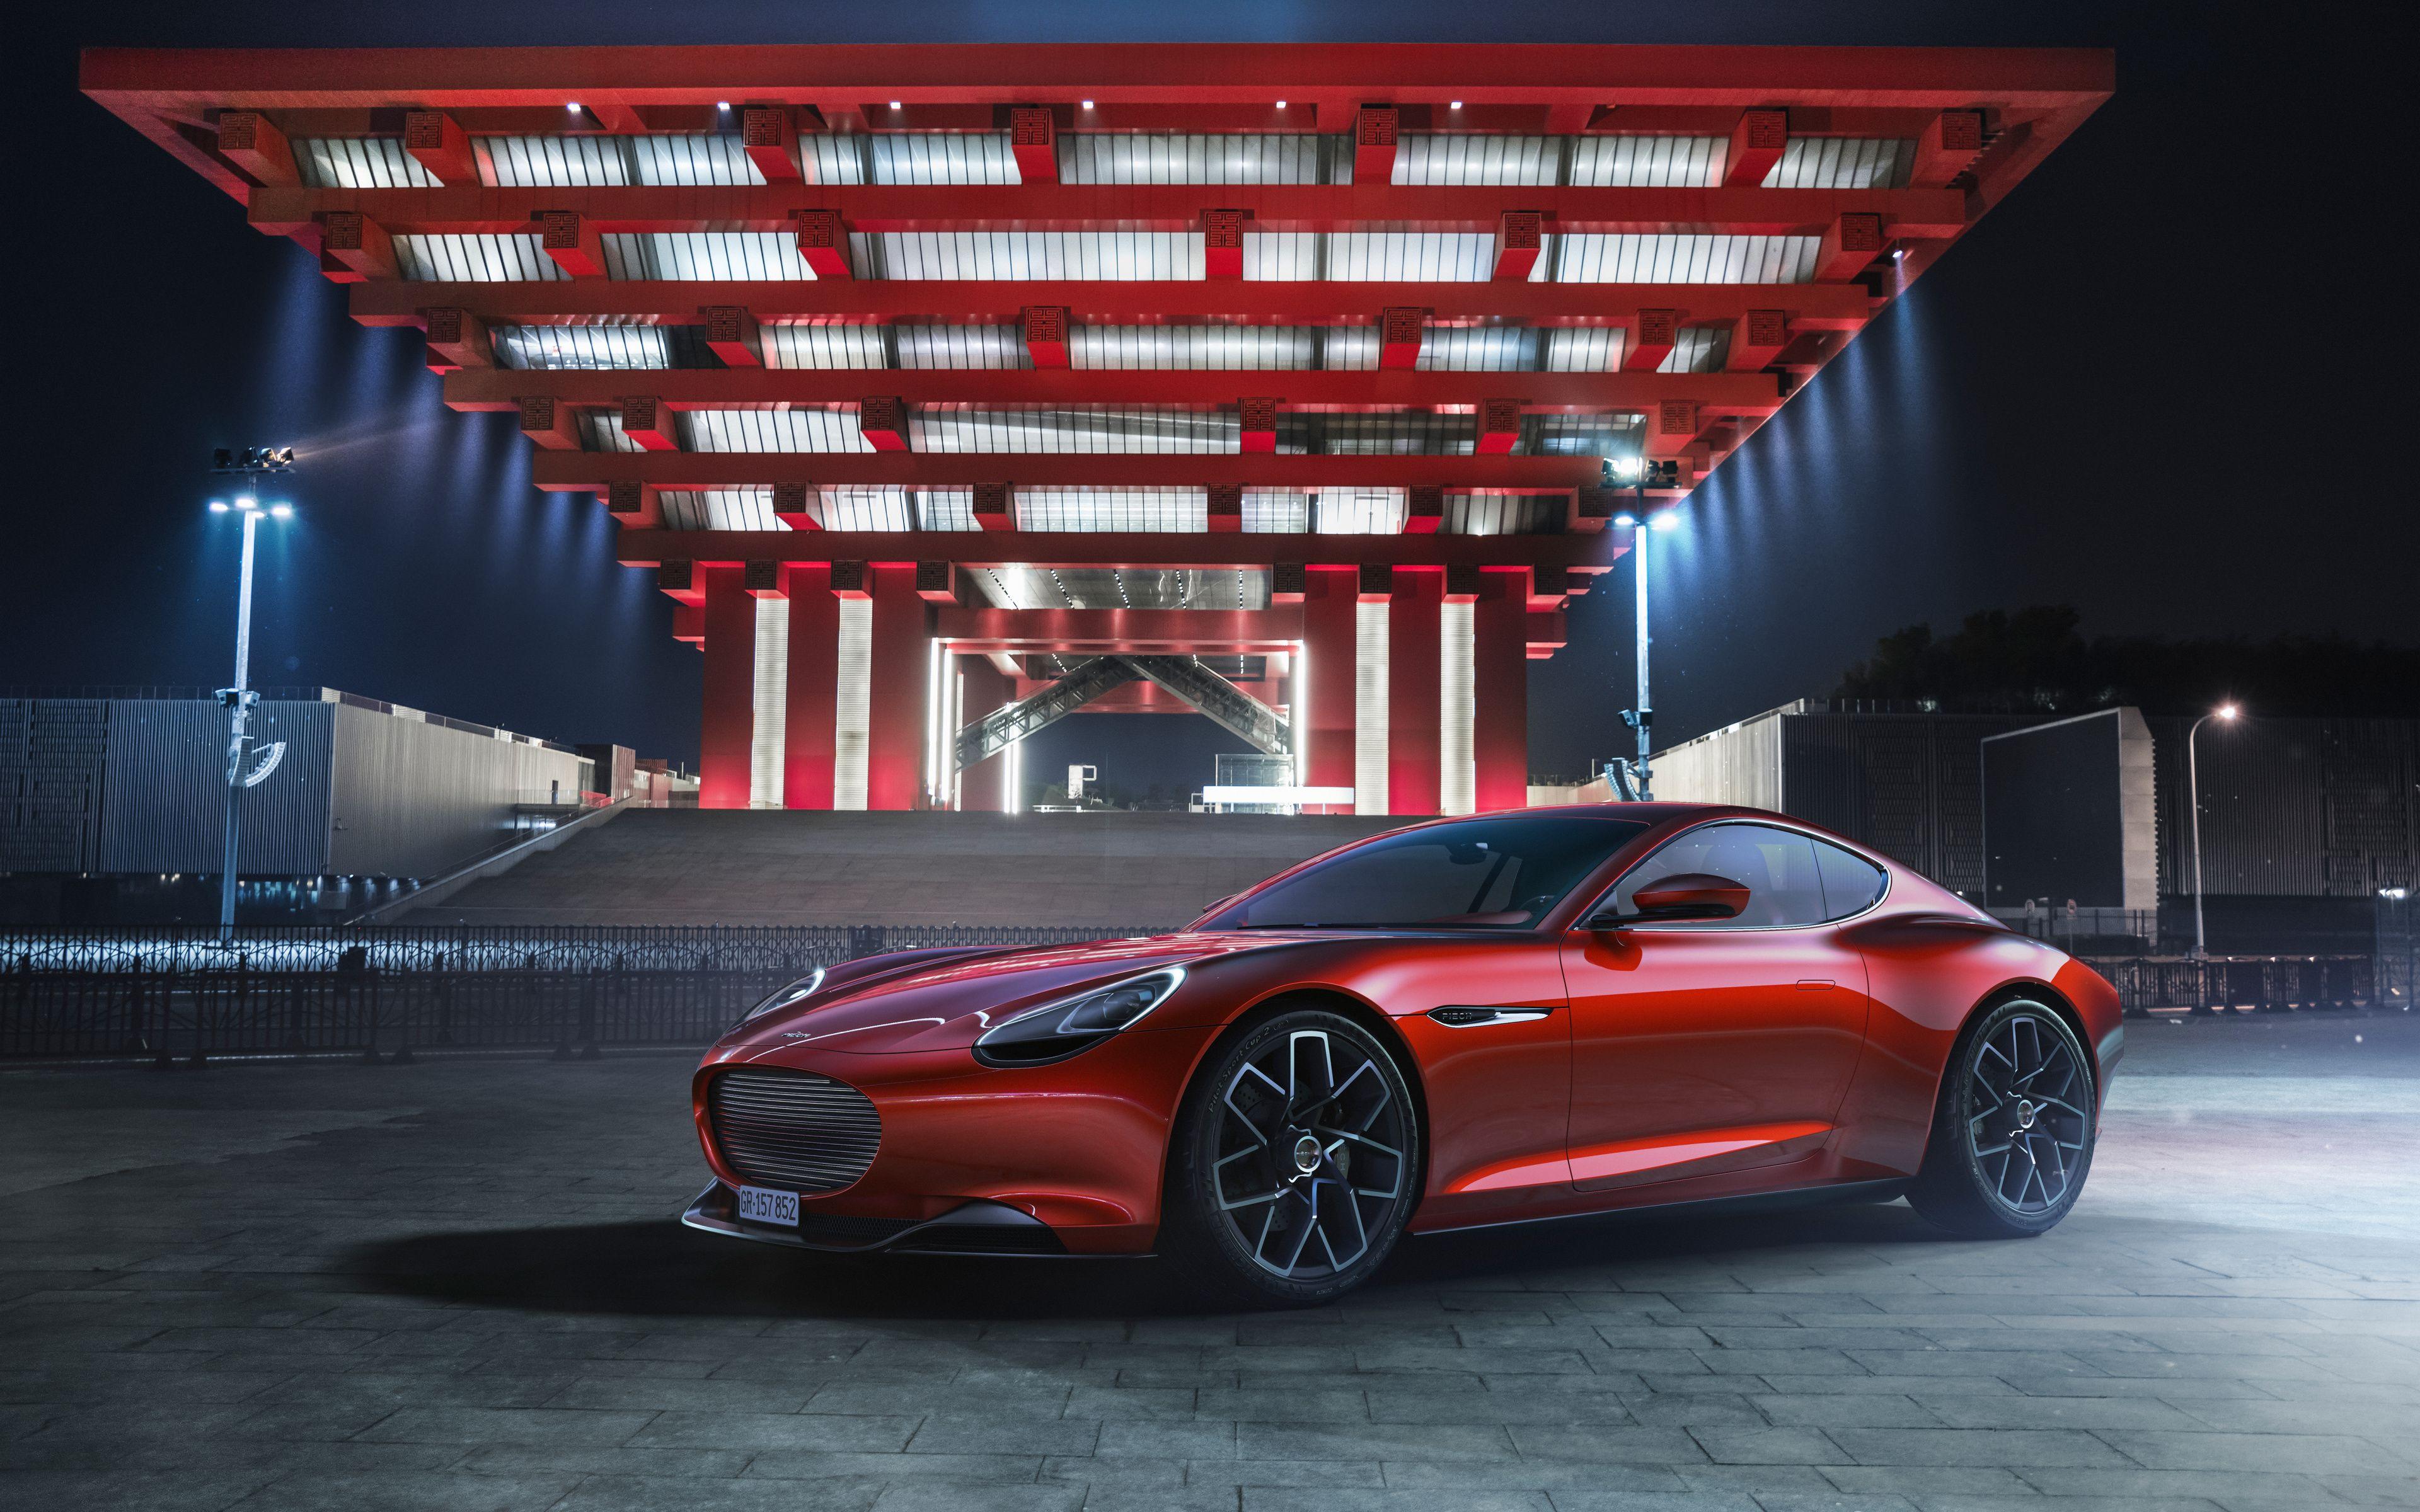 3840x2400 Piëch Mark Zero, 2019 car, red wallpaper Best